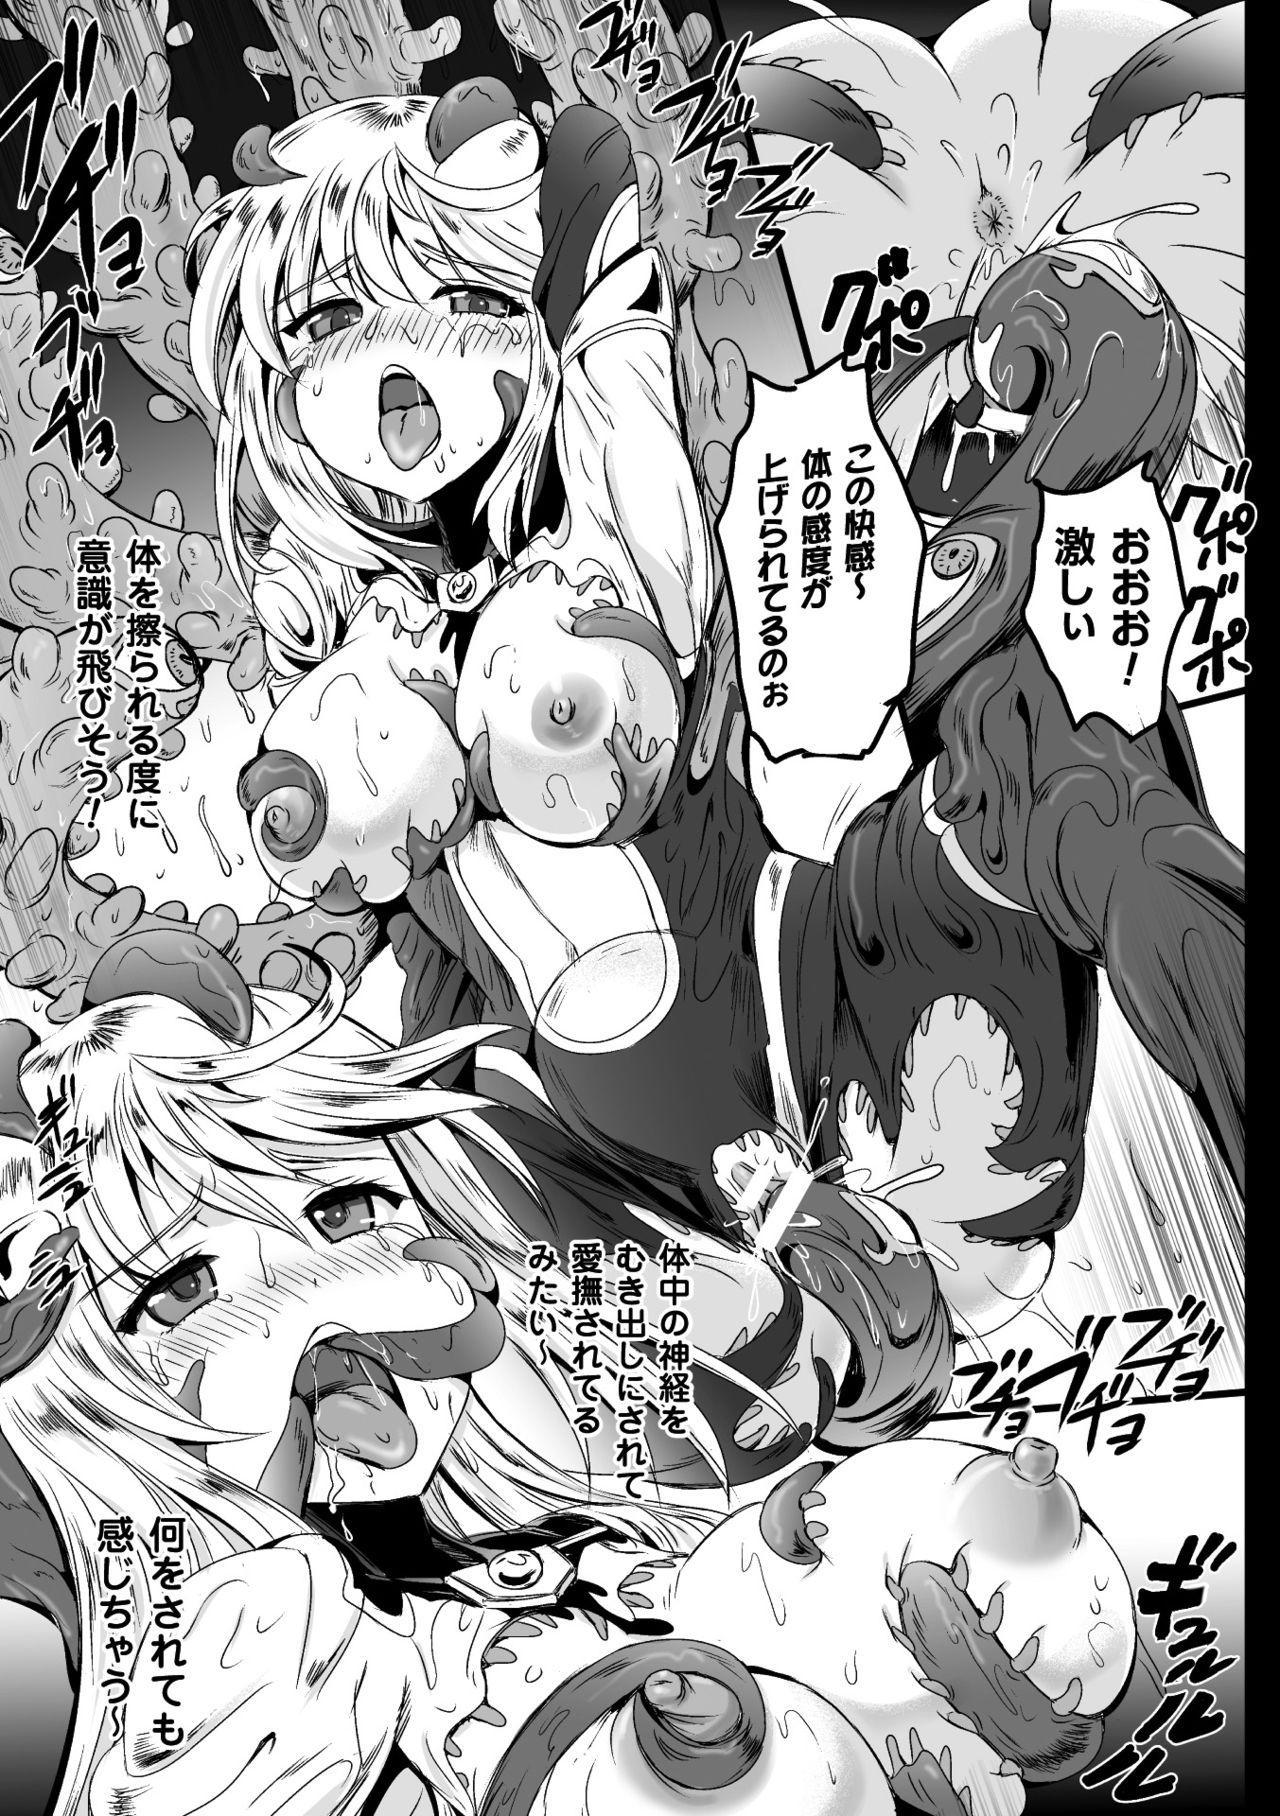 2D Comic Magazine Shokushu Yoroi ni Zenshin o Okasare Mugen Zecchou! Vol. 5 40